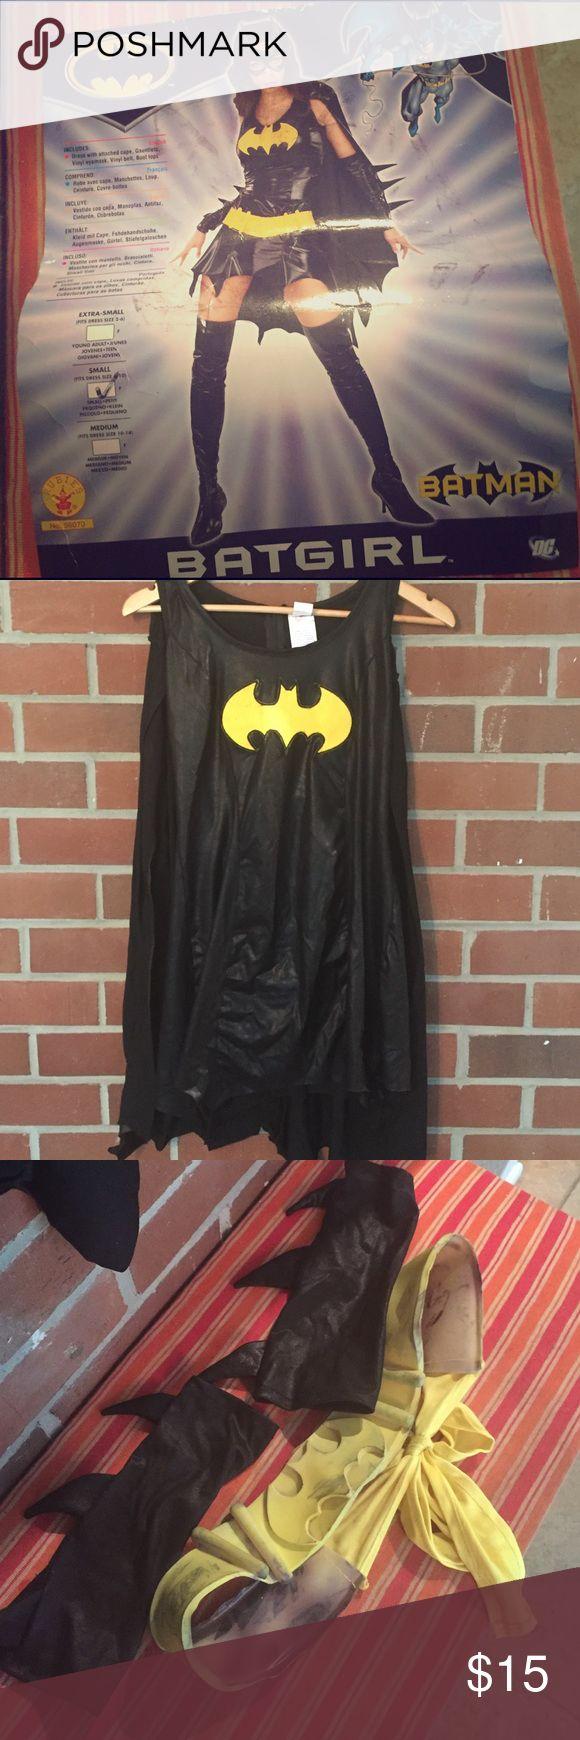 Batgirl costume Sz sm Sexy batgirl costume! Includes dress, gauntlets, belt. Sz sm Batman Other